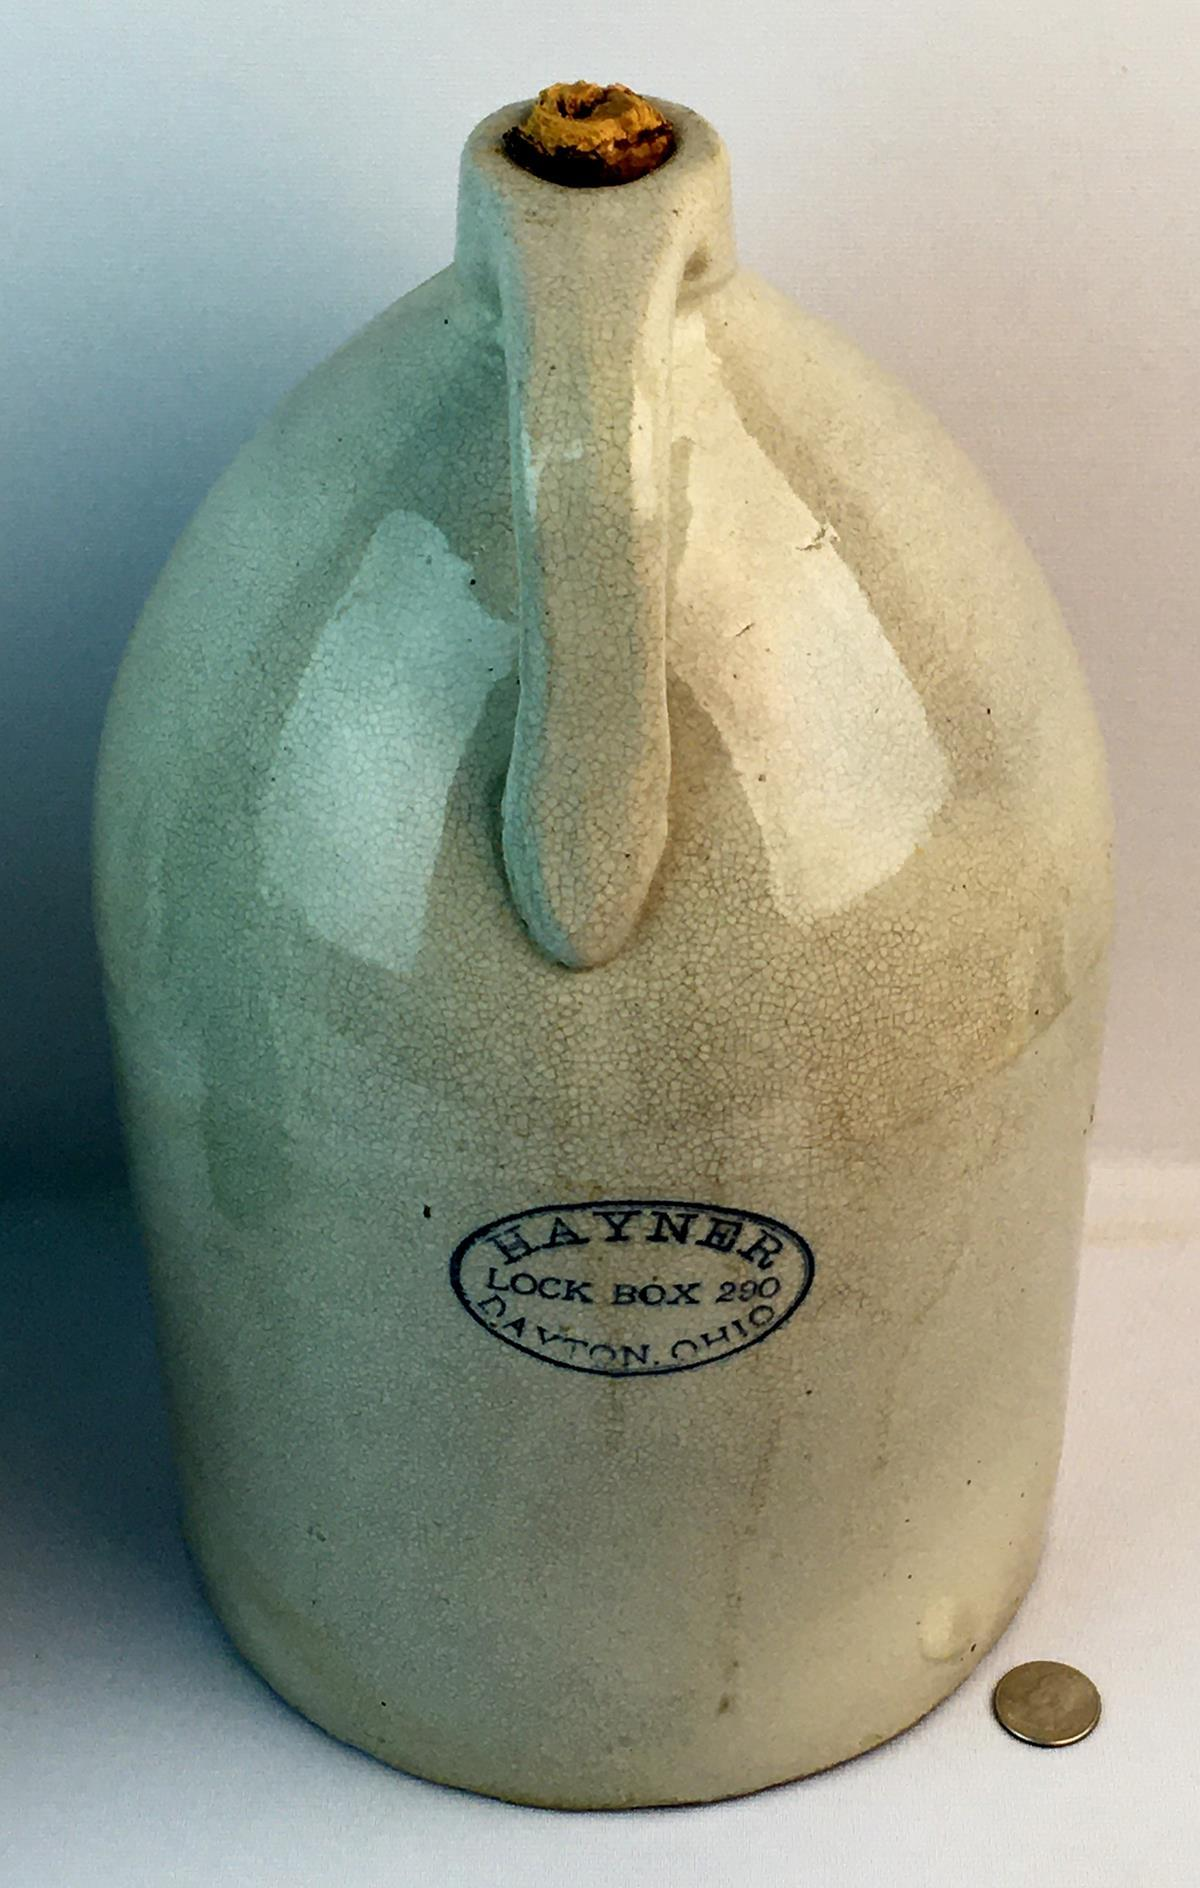 Antique Hayner Lock Box 290 Advertising Stoneware Jug w/ Original Cork Top